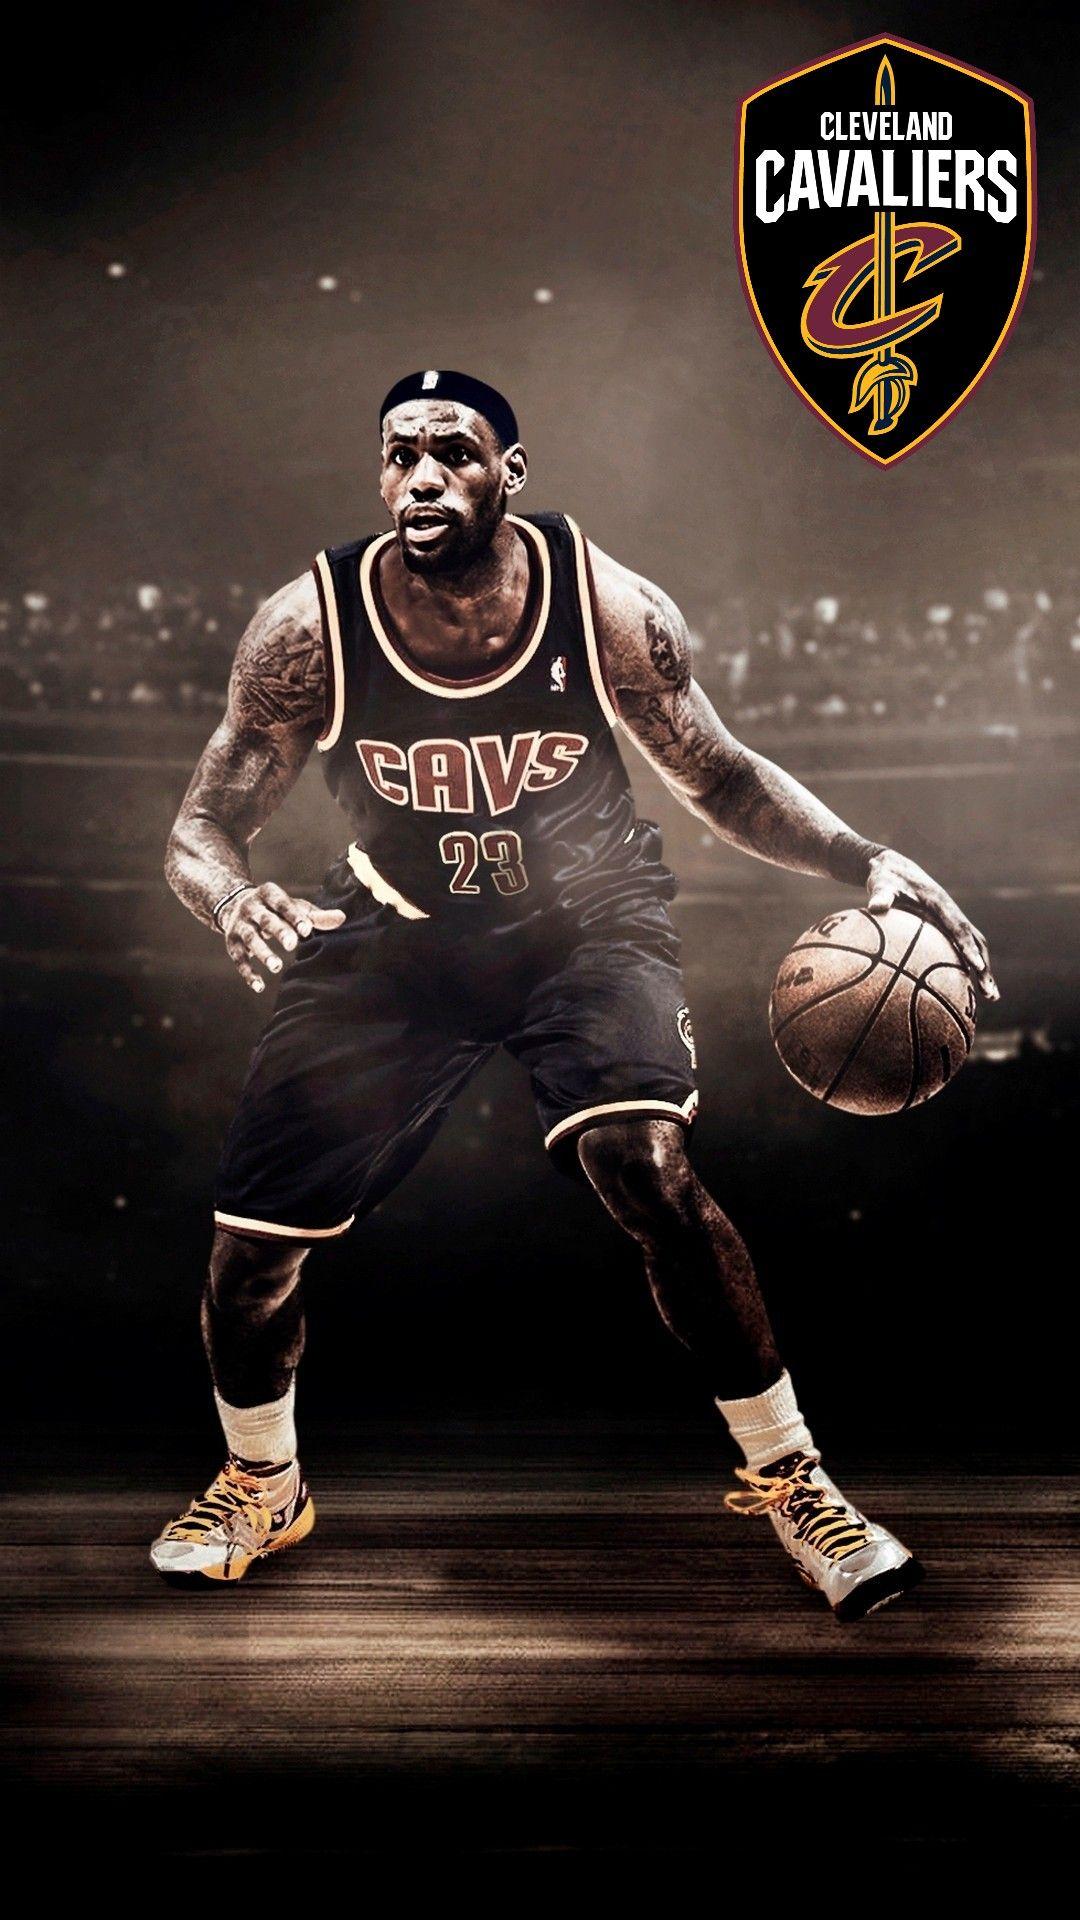 Wallpaper Cleveland Cavaliers NBA Mobile Lebron james